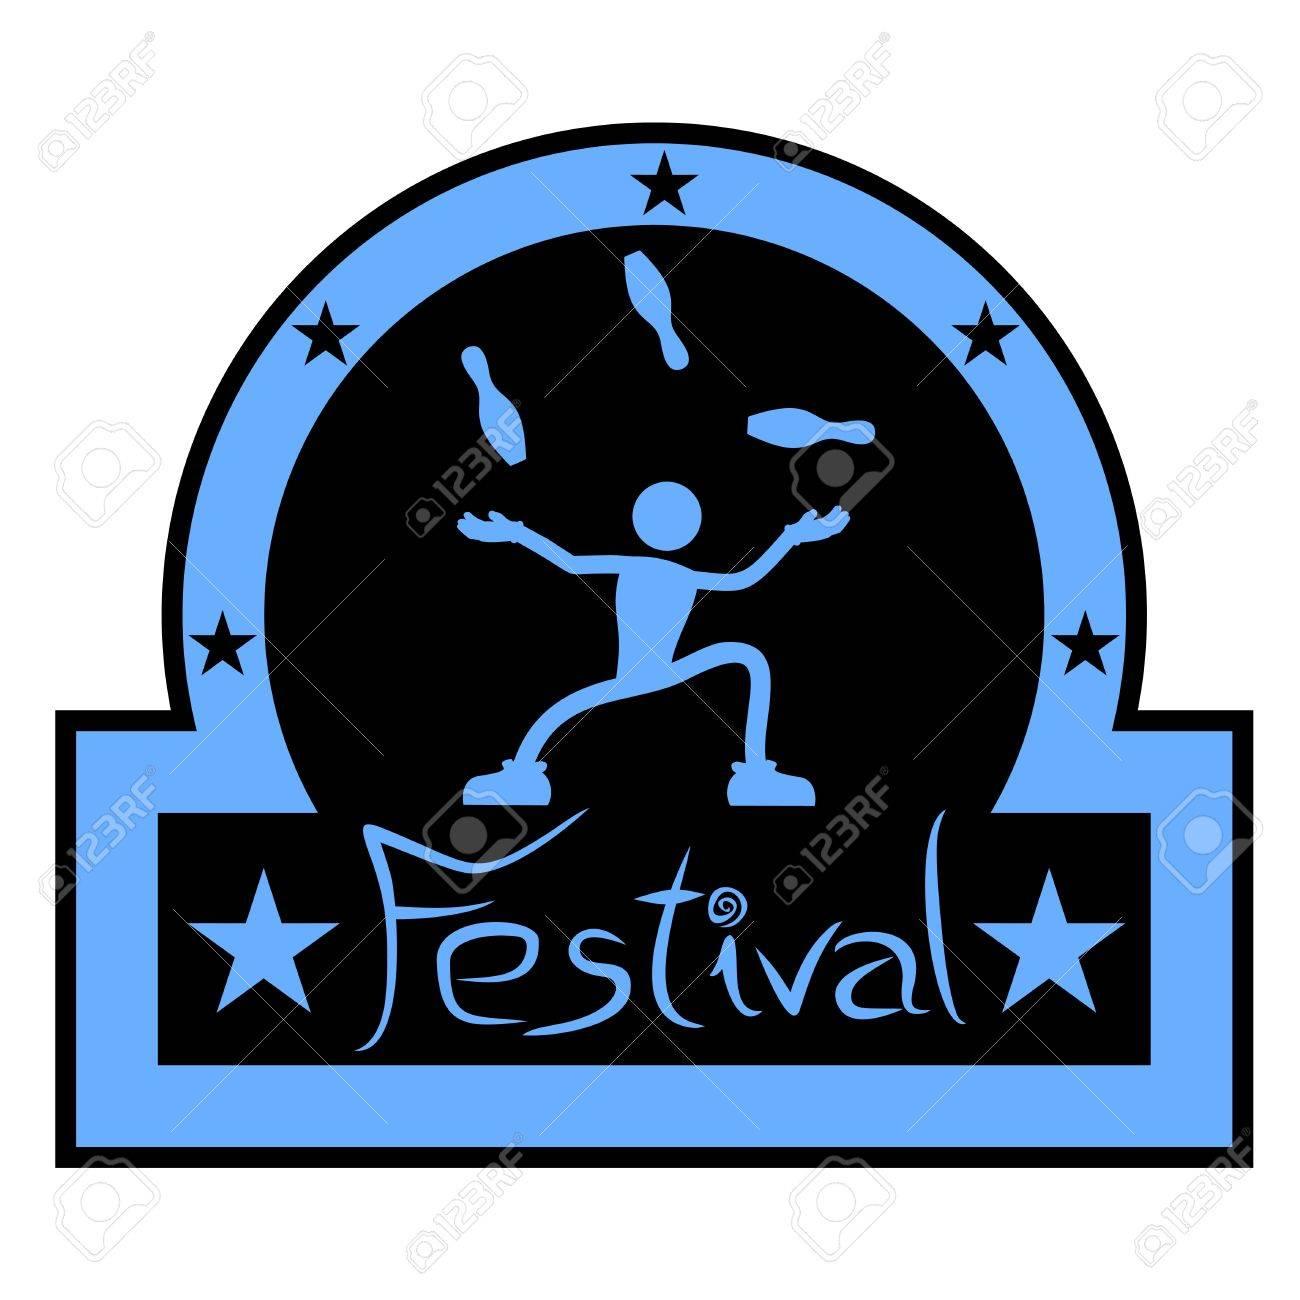 Festival icon Stock Vector - 16622057